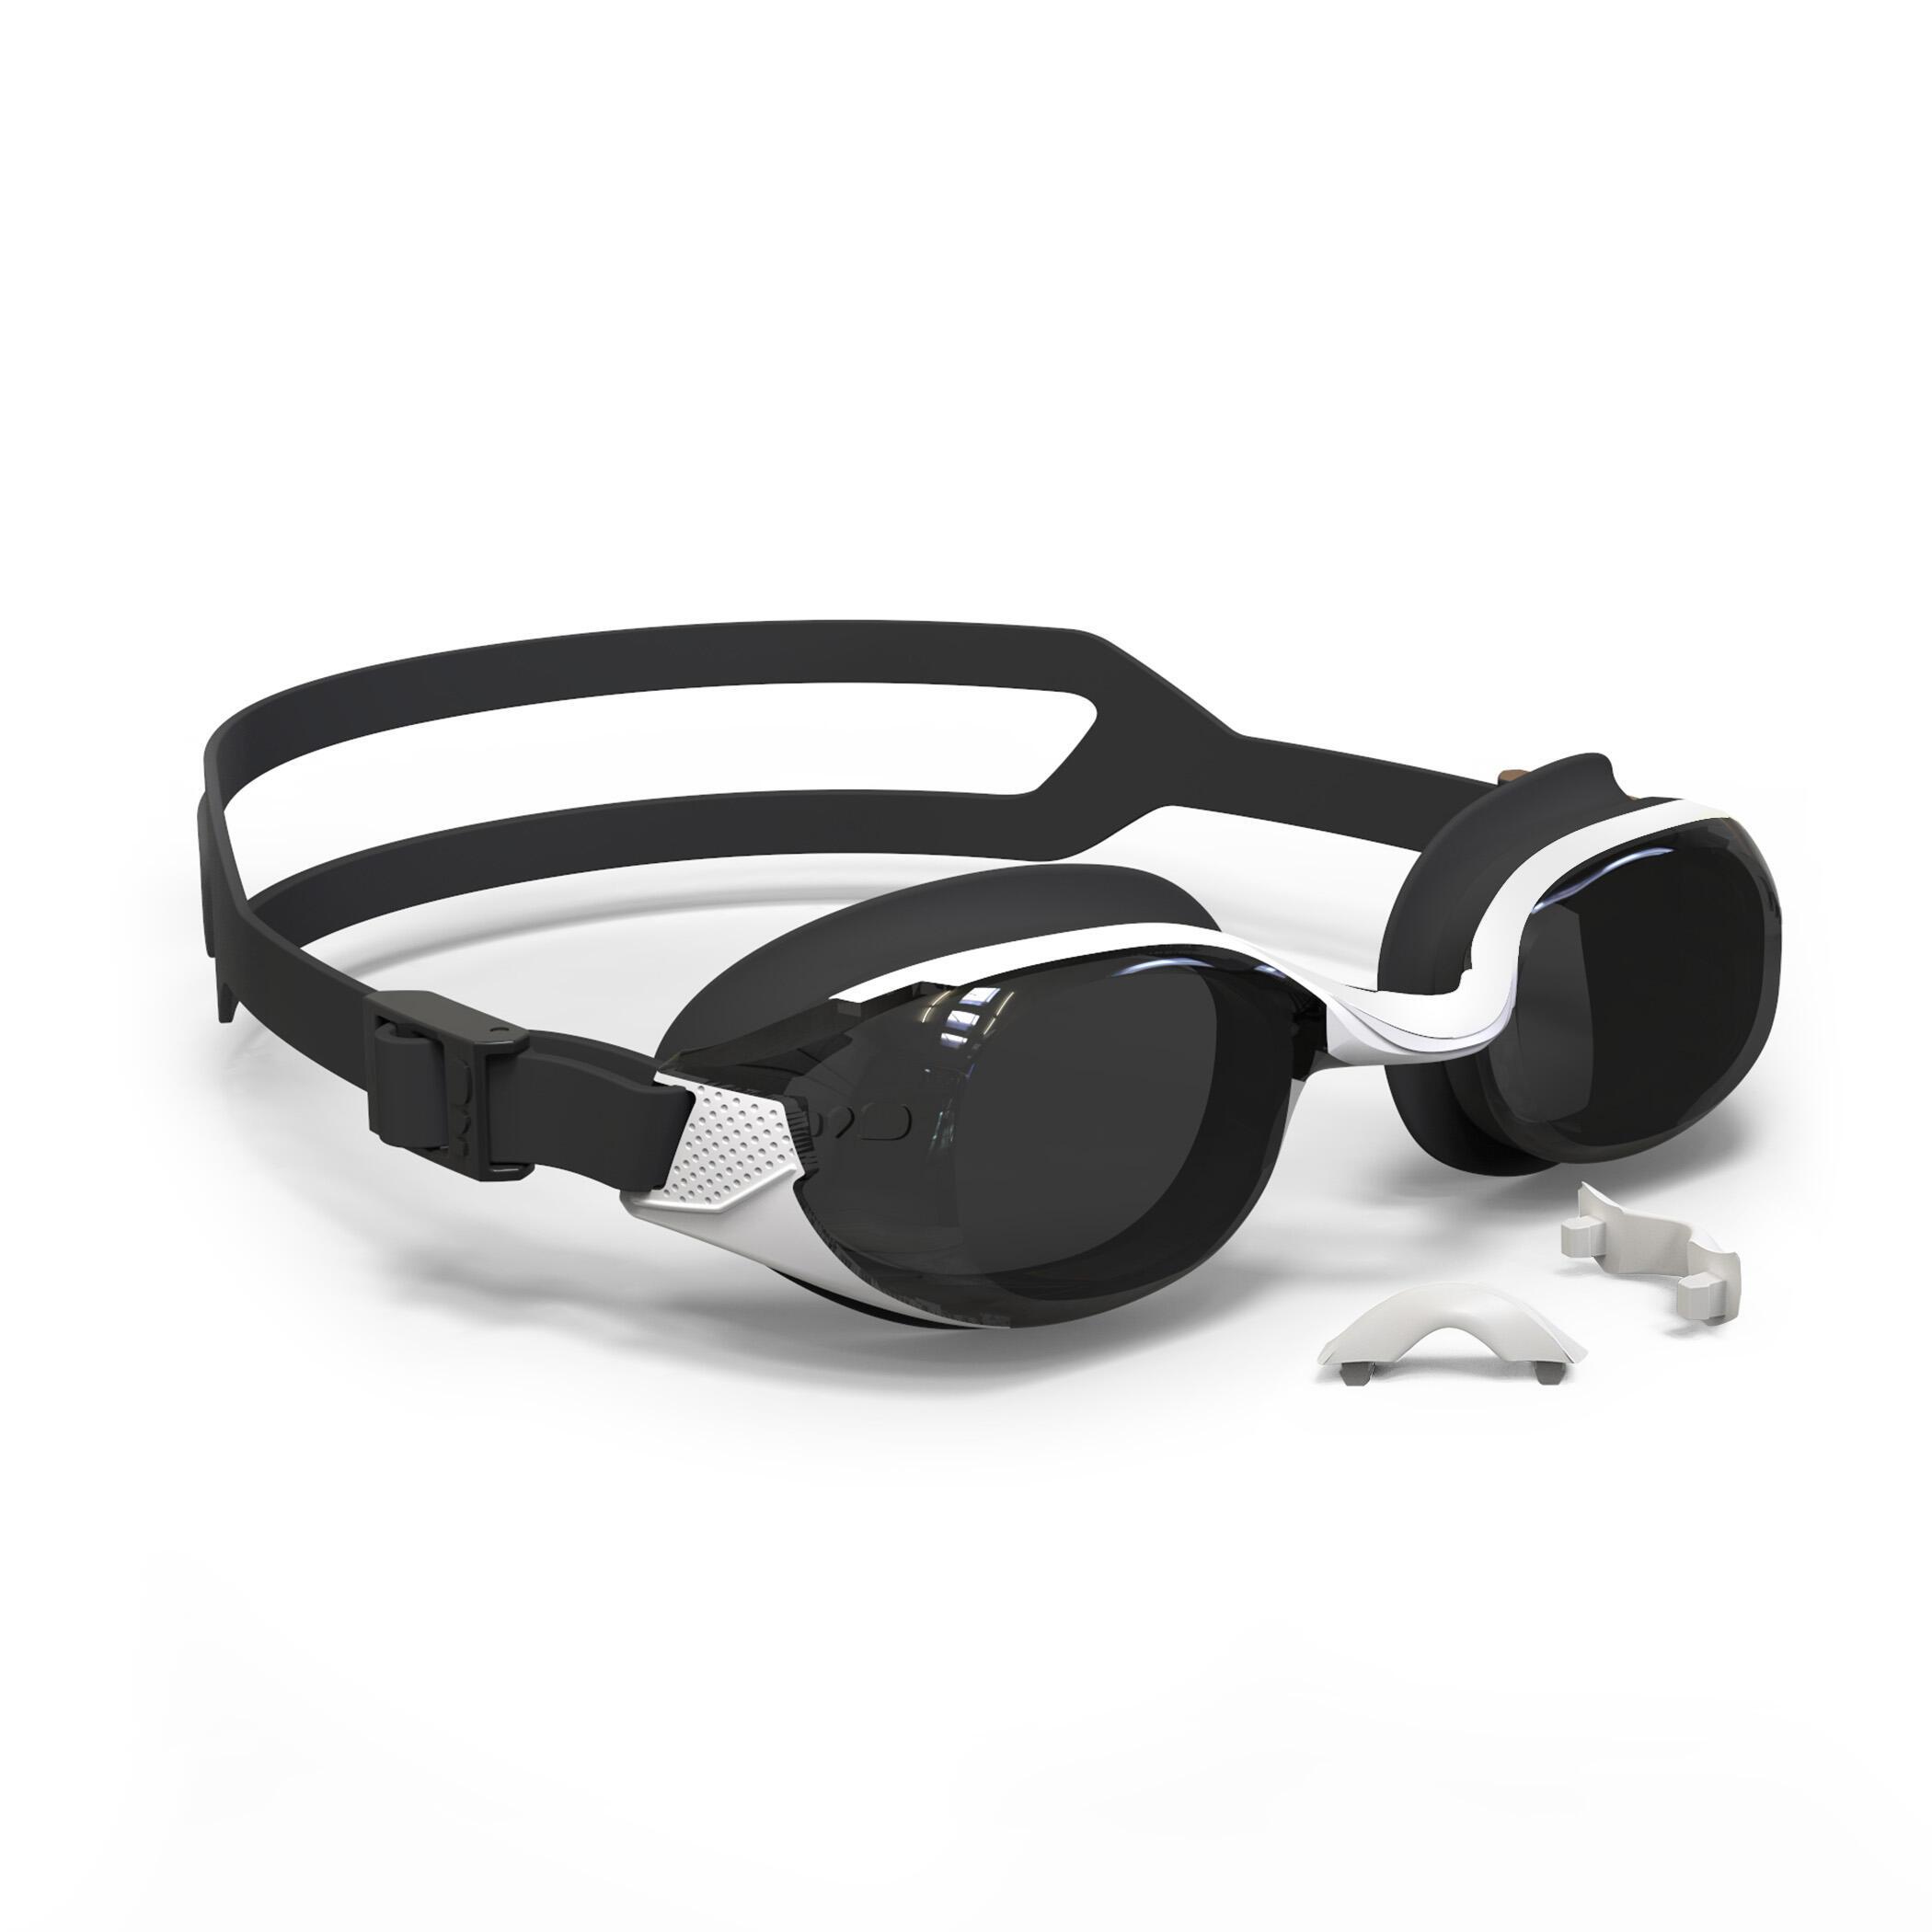 B-Fit Swimming Goggles - White/Black